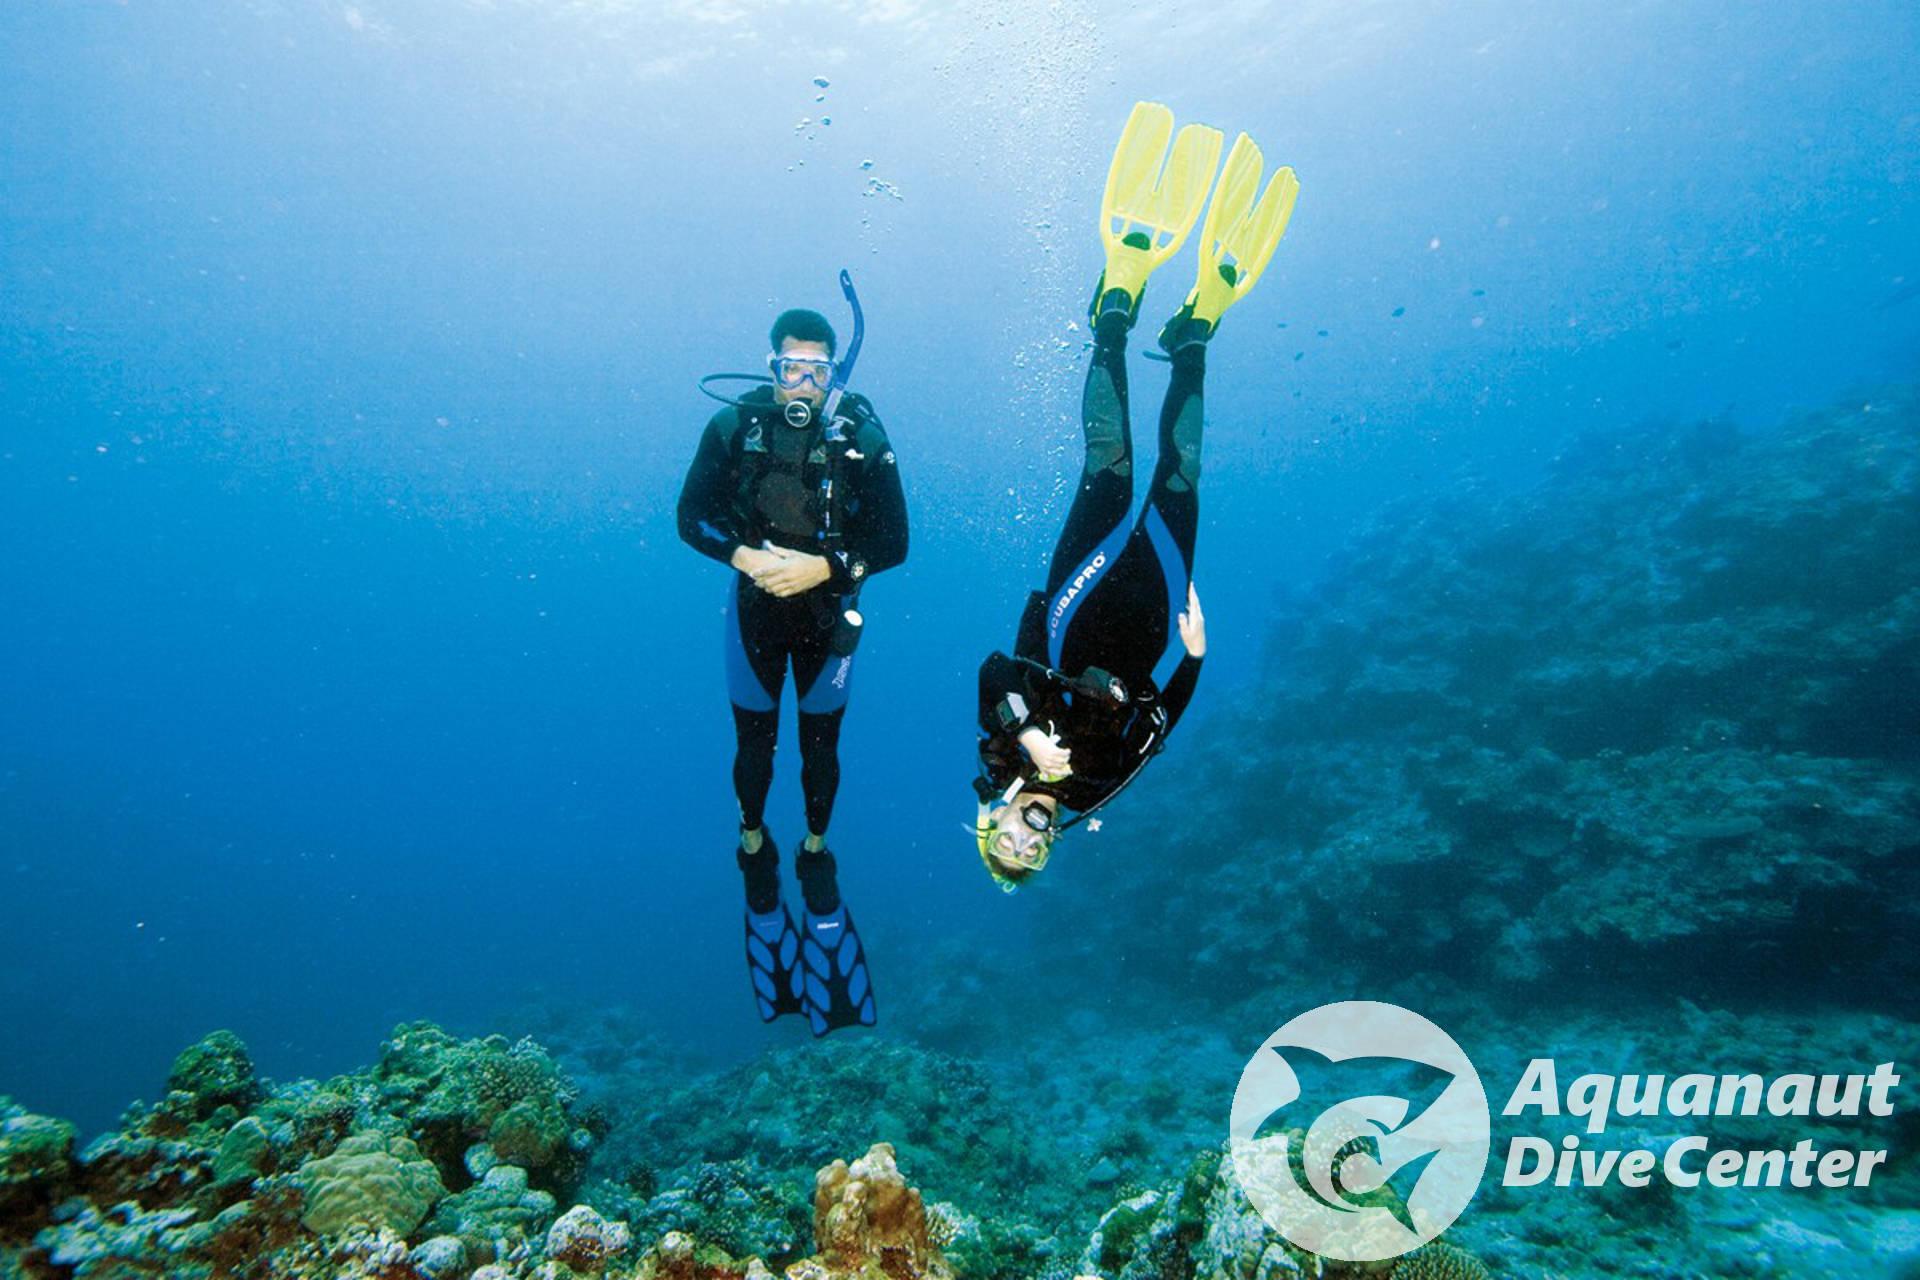 PADI Advanced Open Water Diver course - Peak Performance Buoyancy